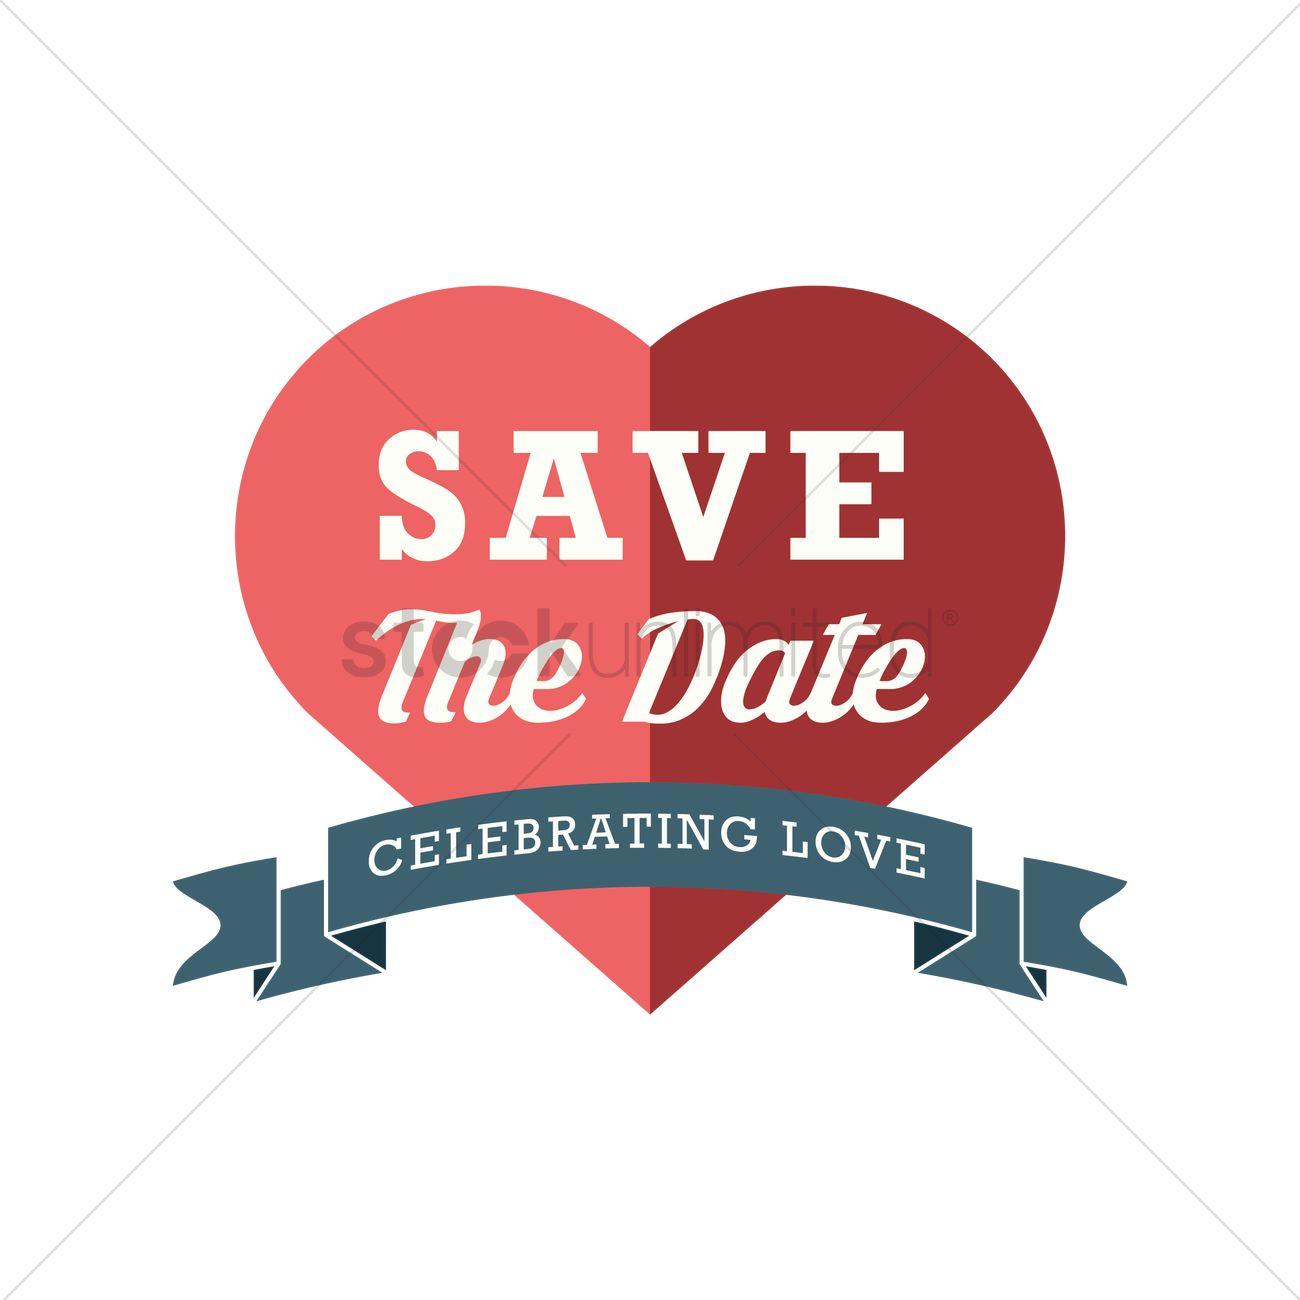 Wedding invitation design Vector Image - 1986001 | StockUnlimited